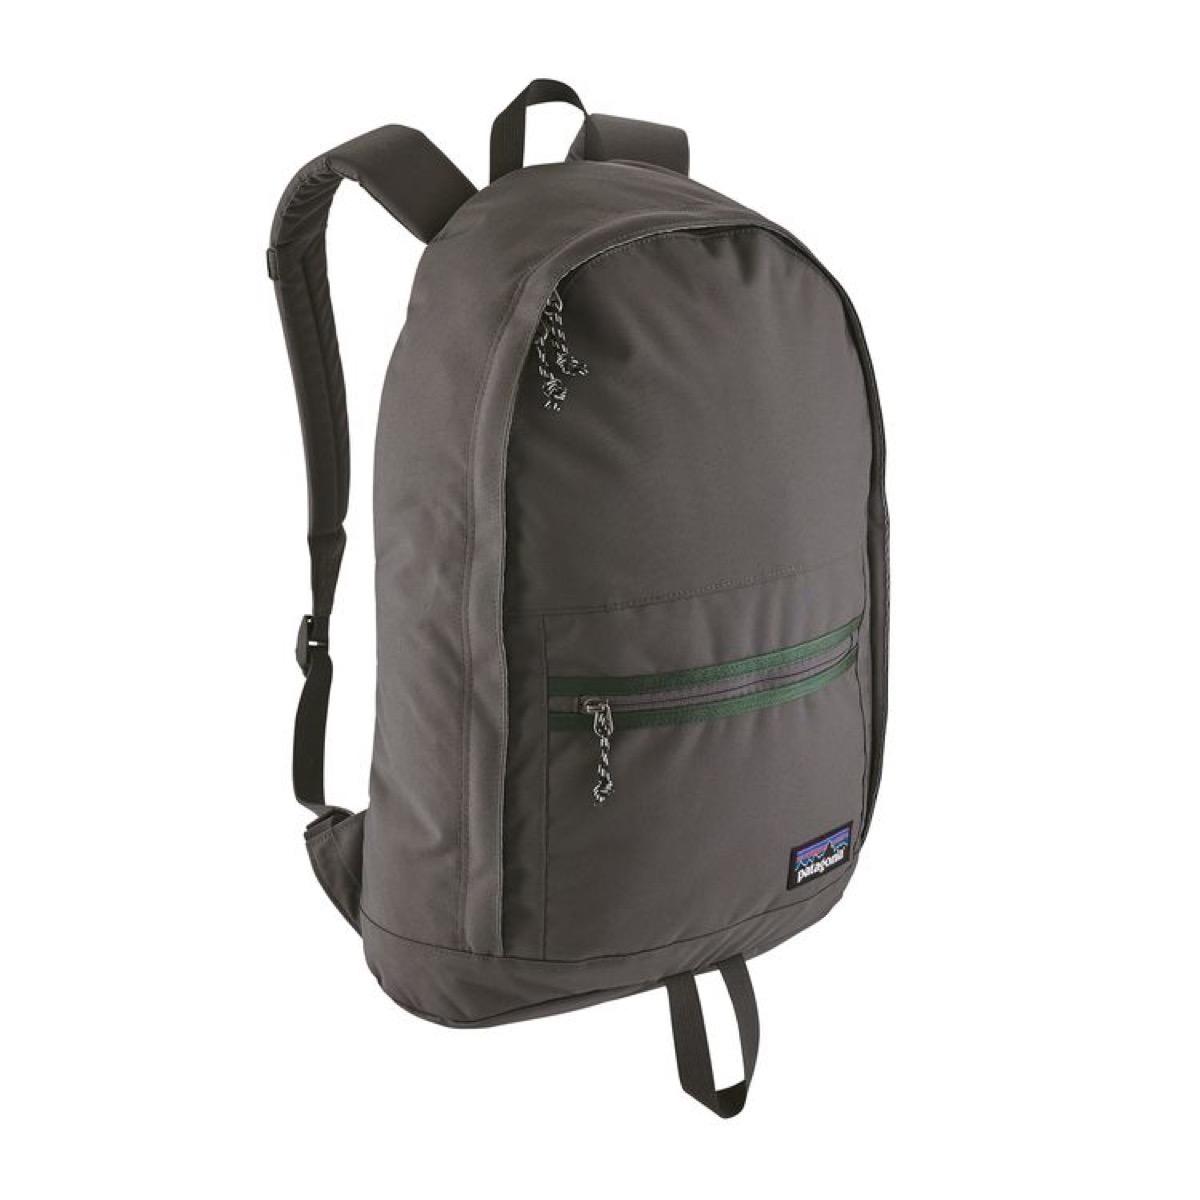 patagonia arbor daypack, best boyfriend gifts